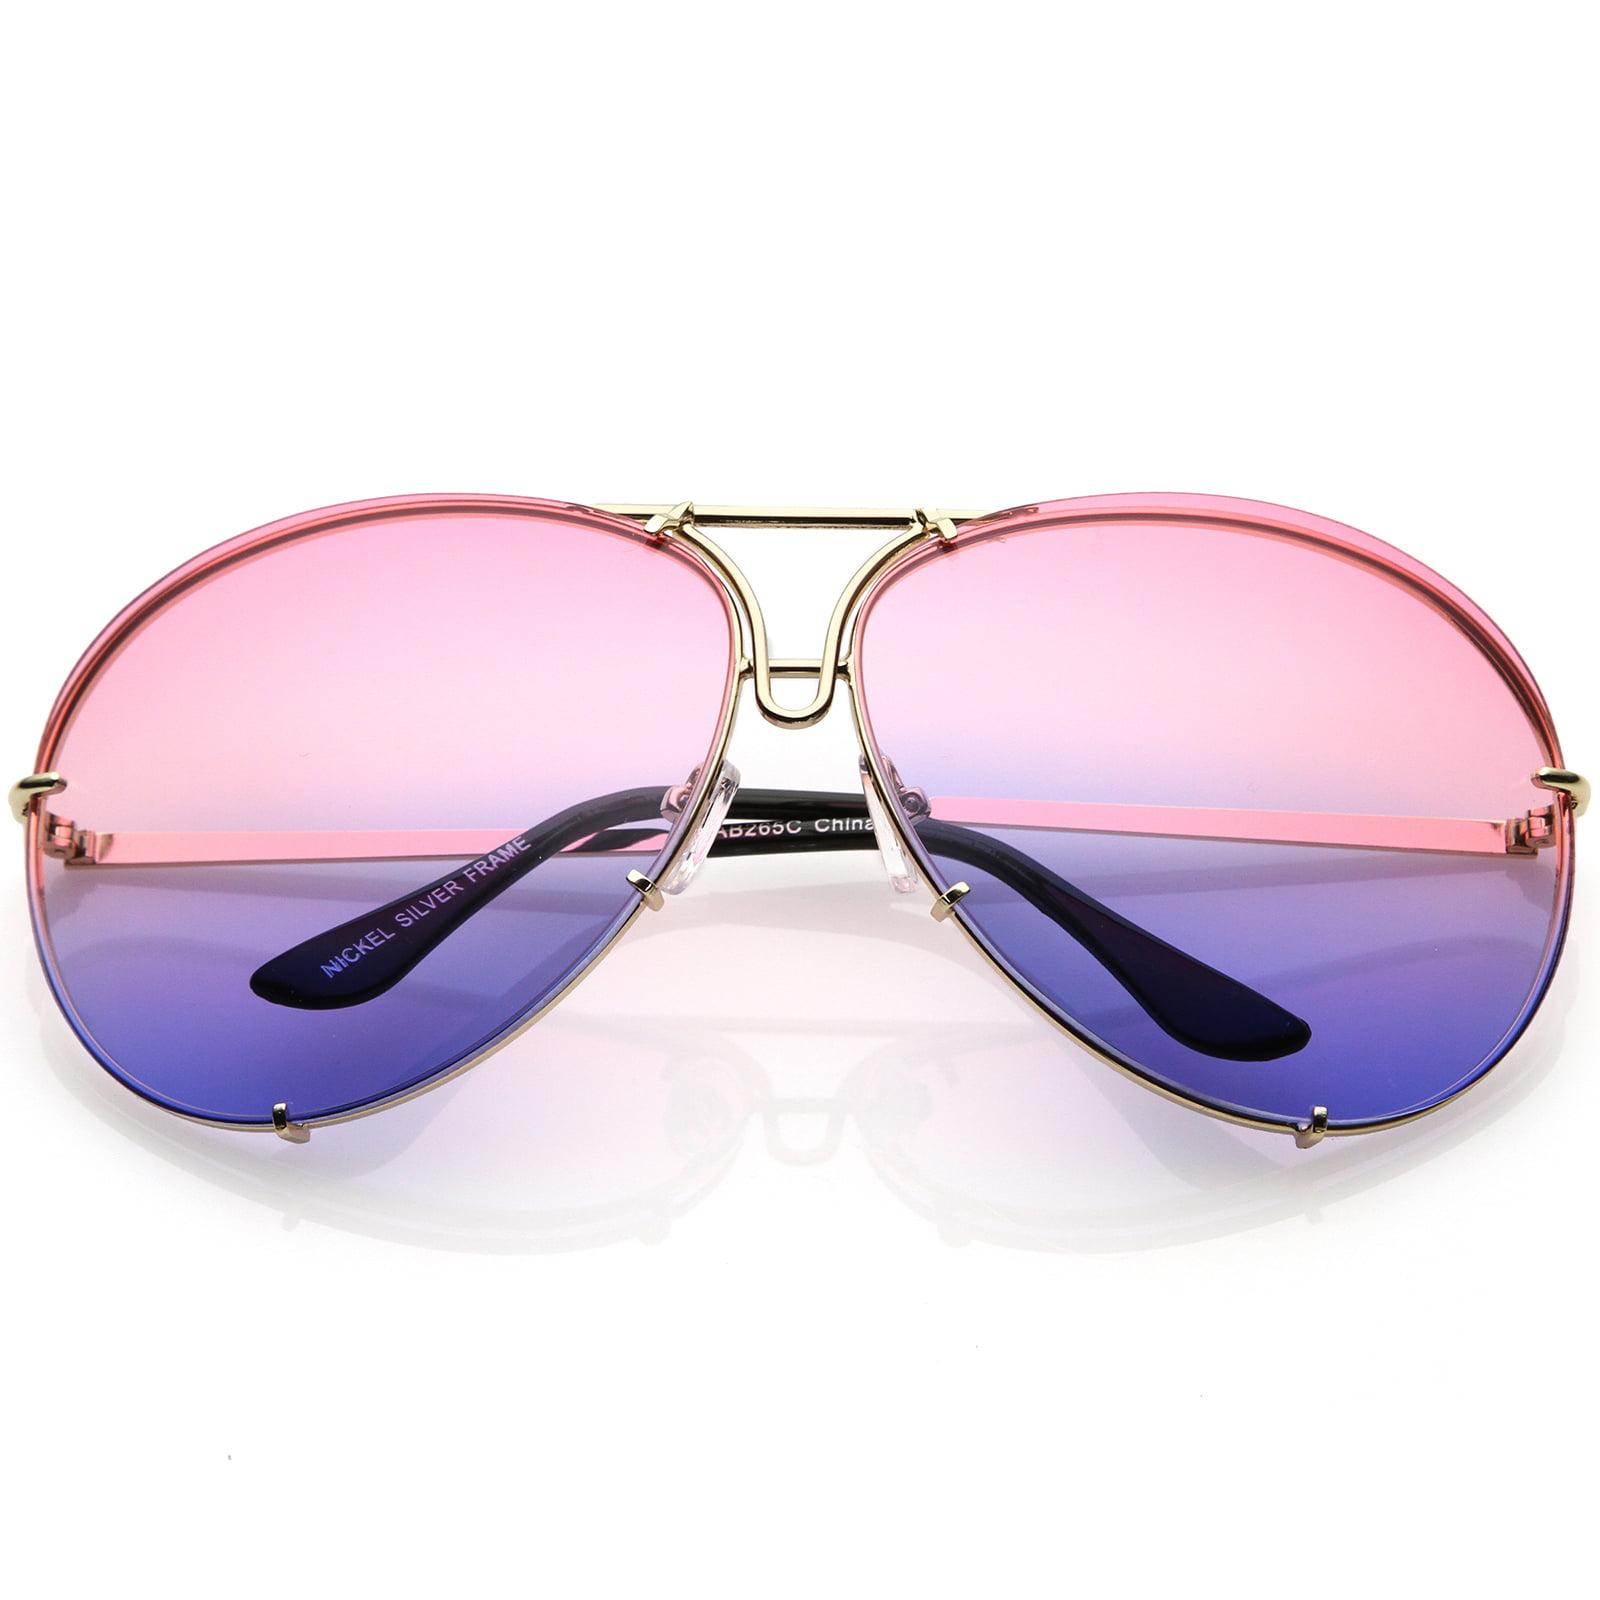 b25a8f14378b sunglassLA - Oversize Aviator Sunglasses Slim Metal Arms Color Tinted  Gradient Lens 68mm (Gold   Pink Blue) - Walmart.com